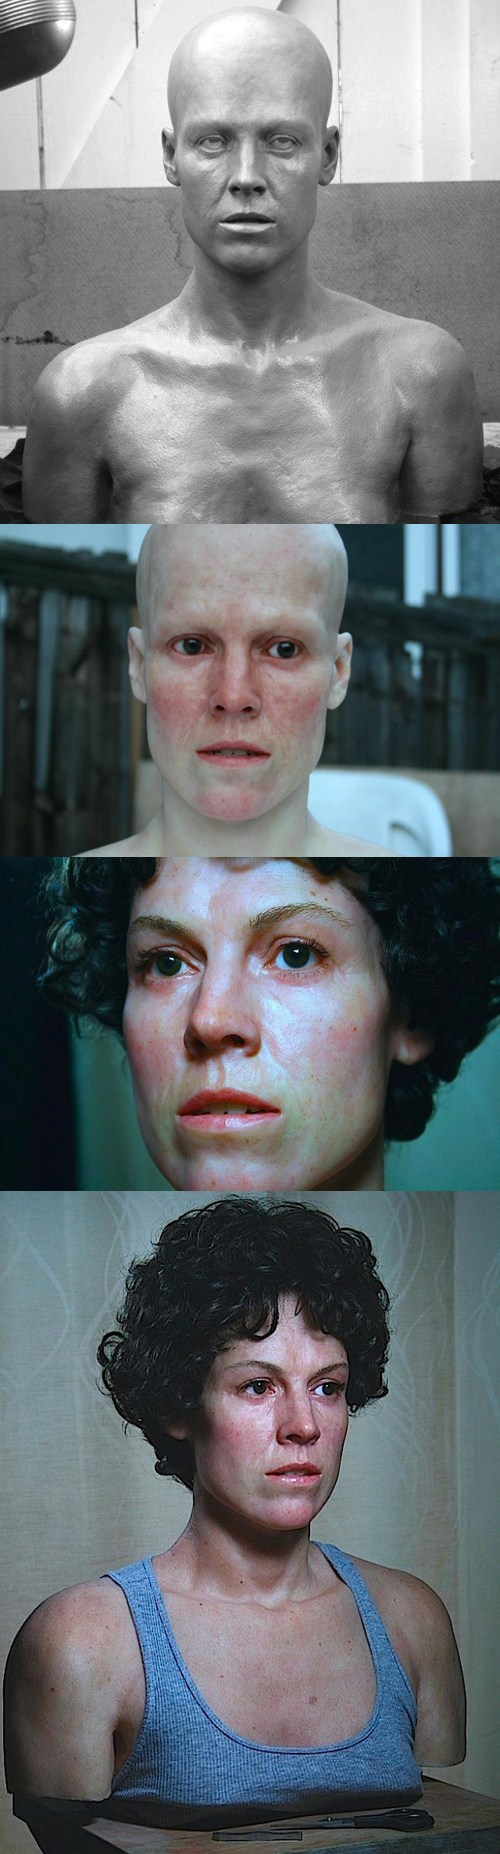 sigourney weaver,statue,Ellen Ripley,bust,Aliens,realistic,uncanny valley